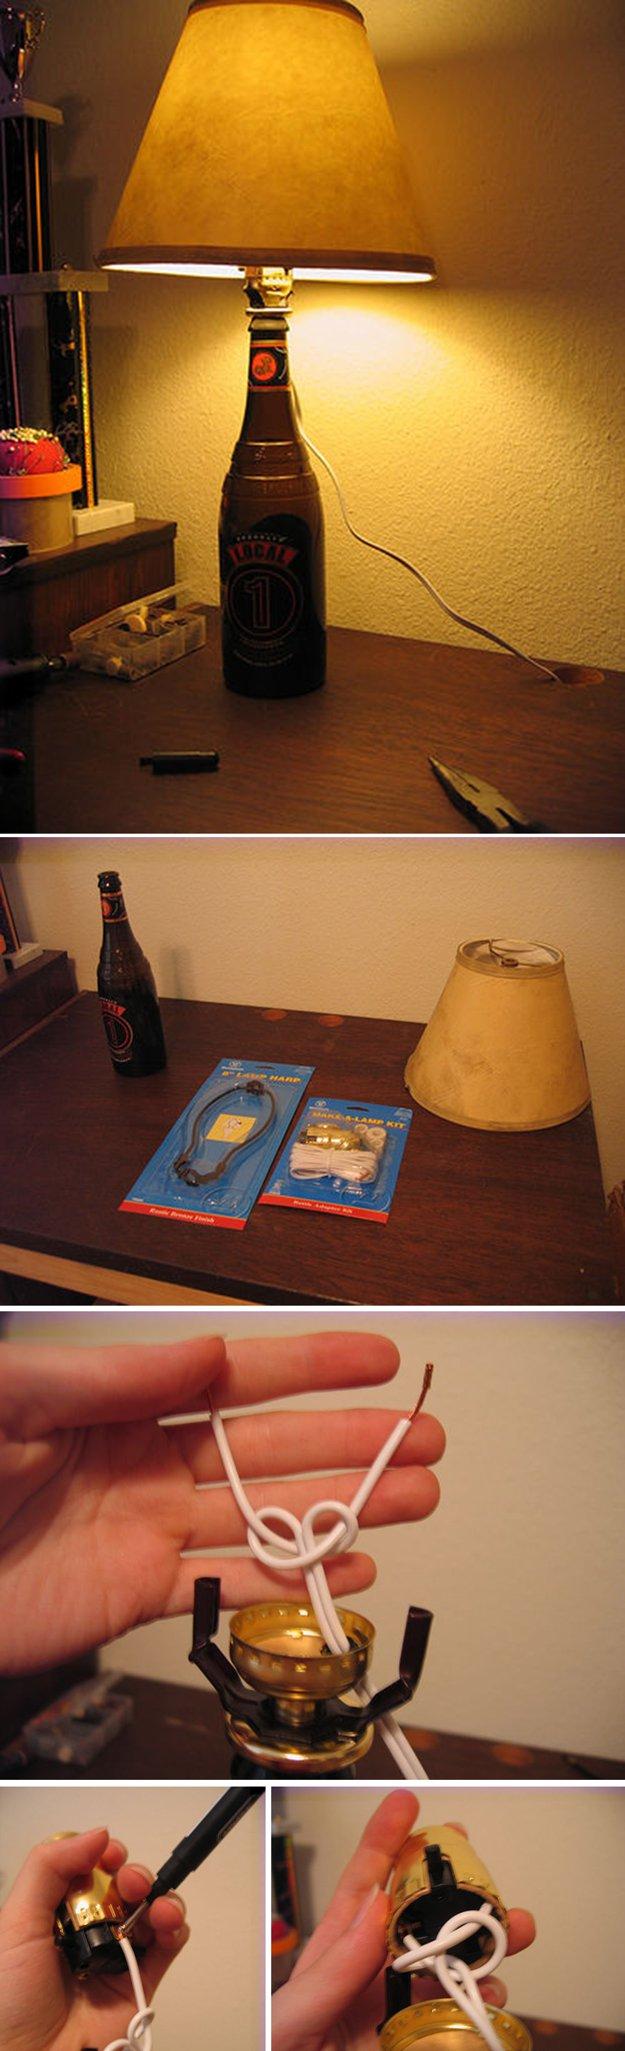 28 Beer Bottle Lamp